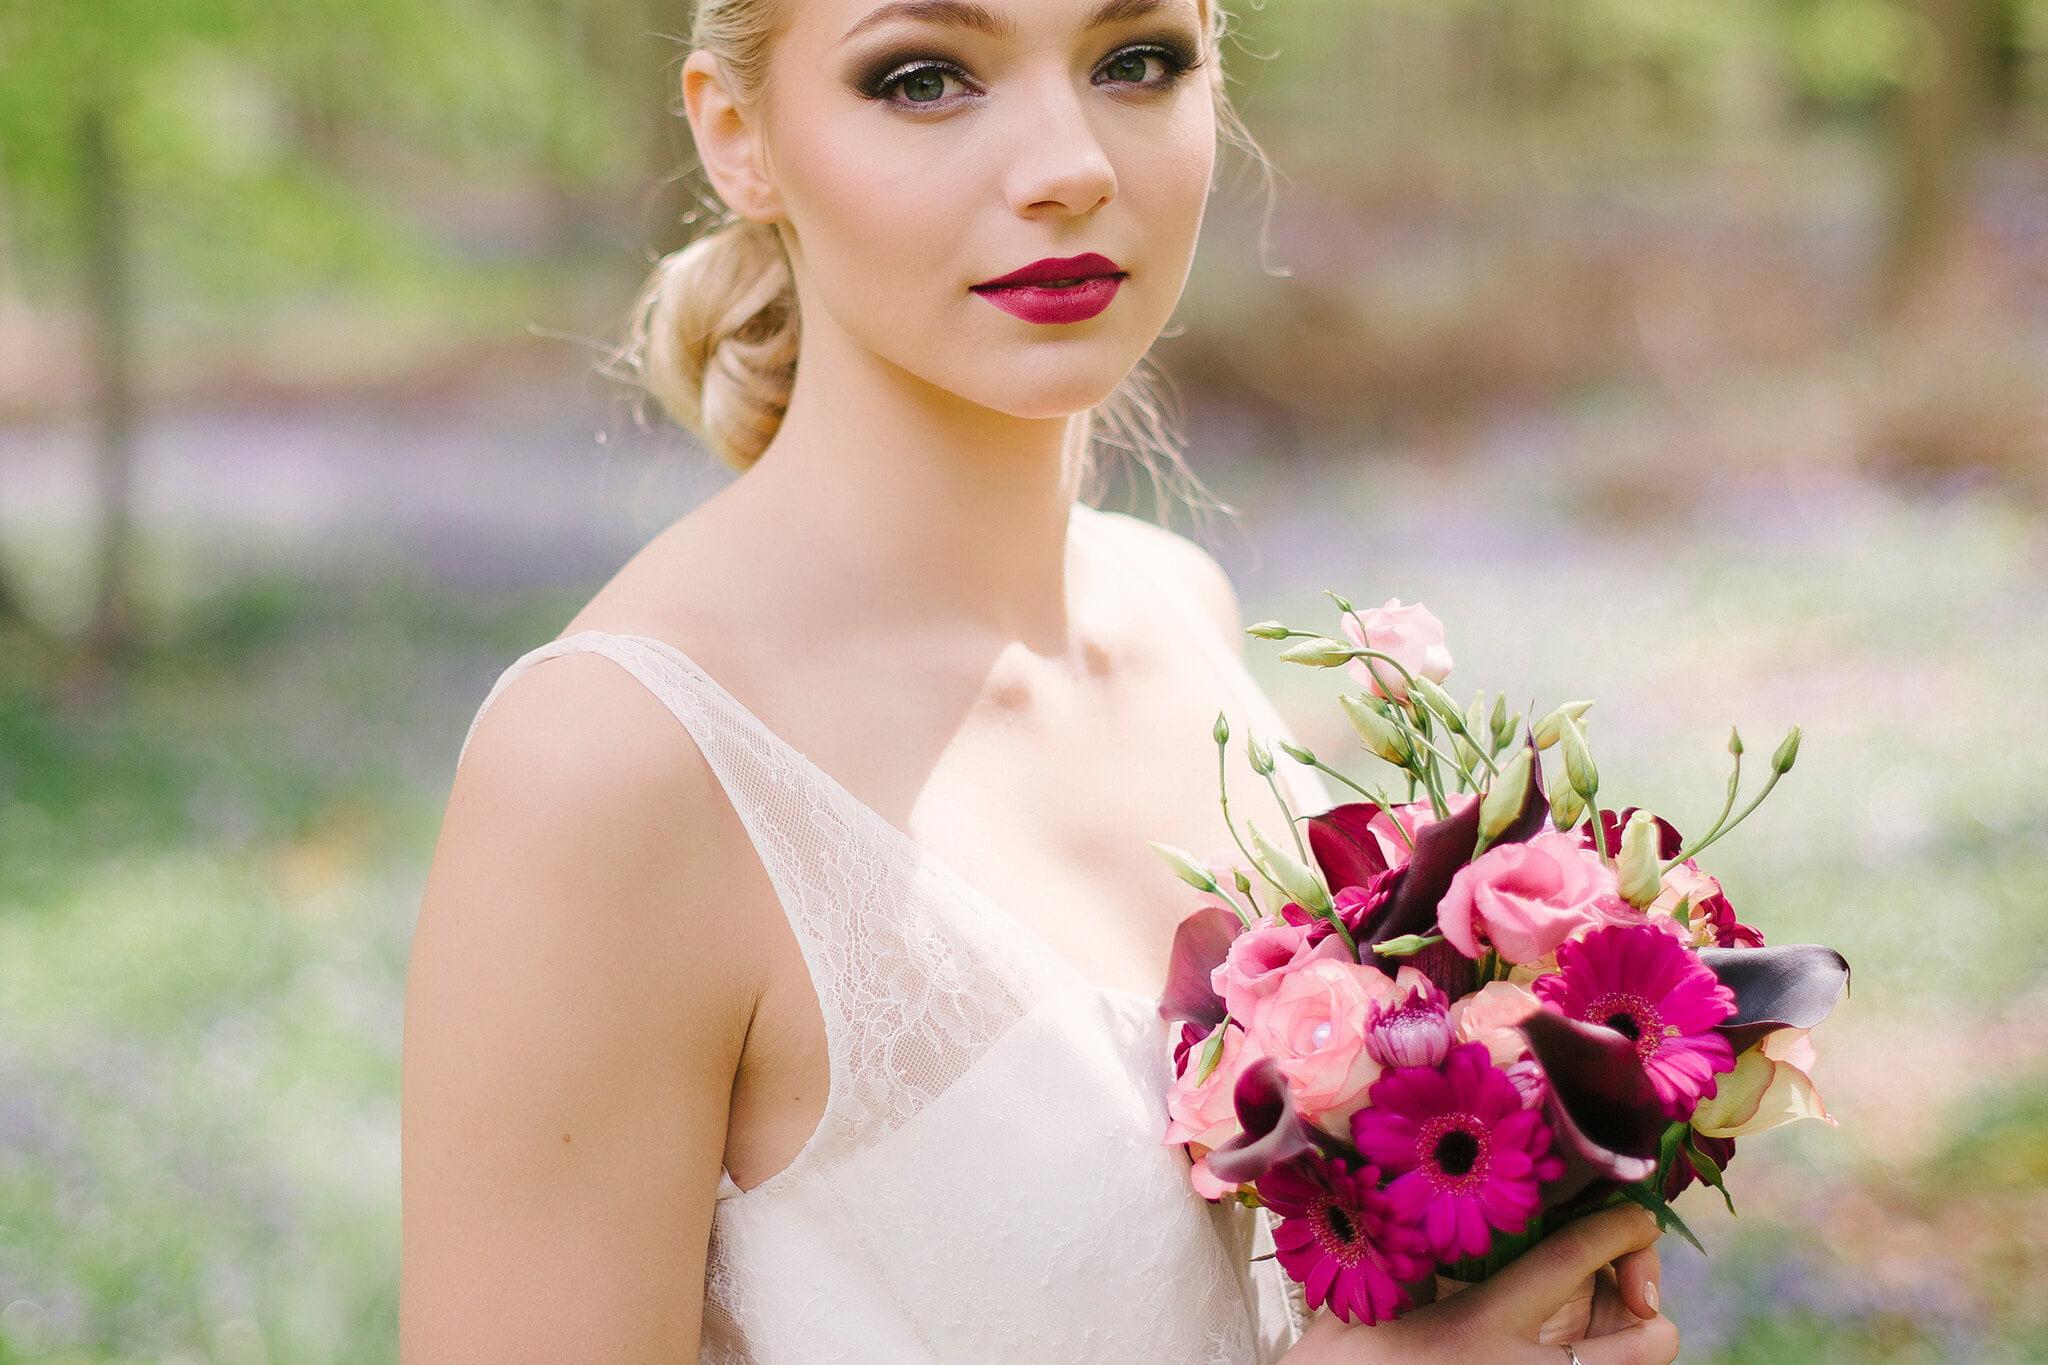 Blue Fairy Forest Bridal Shoot Kasia Bacq 025 1 uai